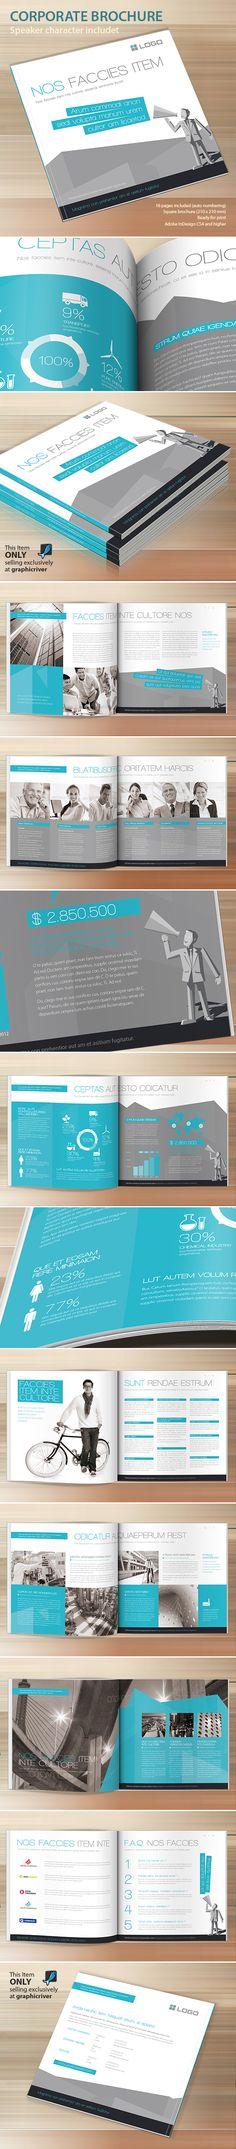 Corporate Brochure by Paulnomade Paulnomade, via Behance